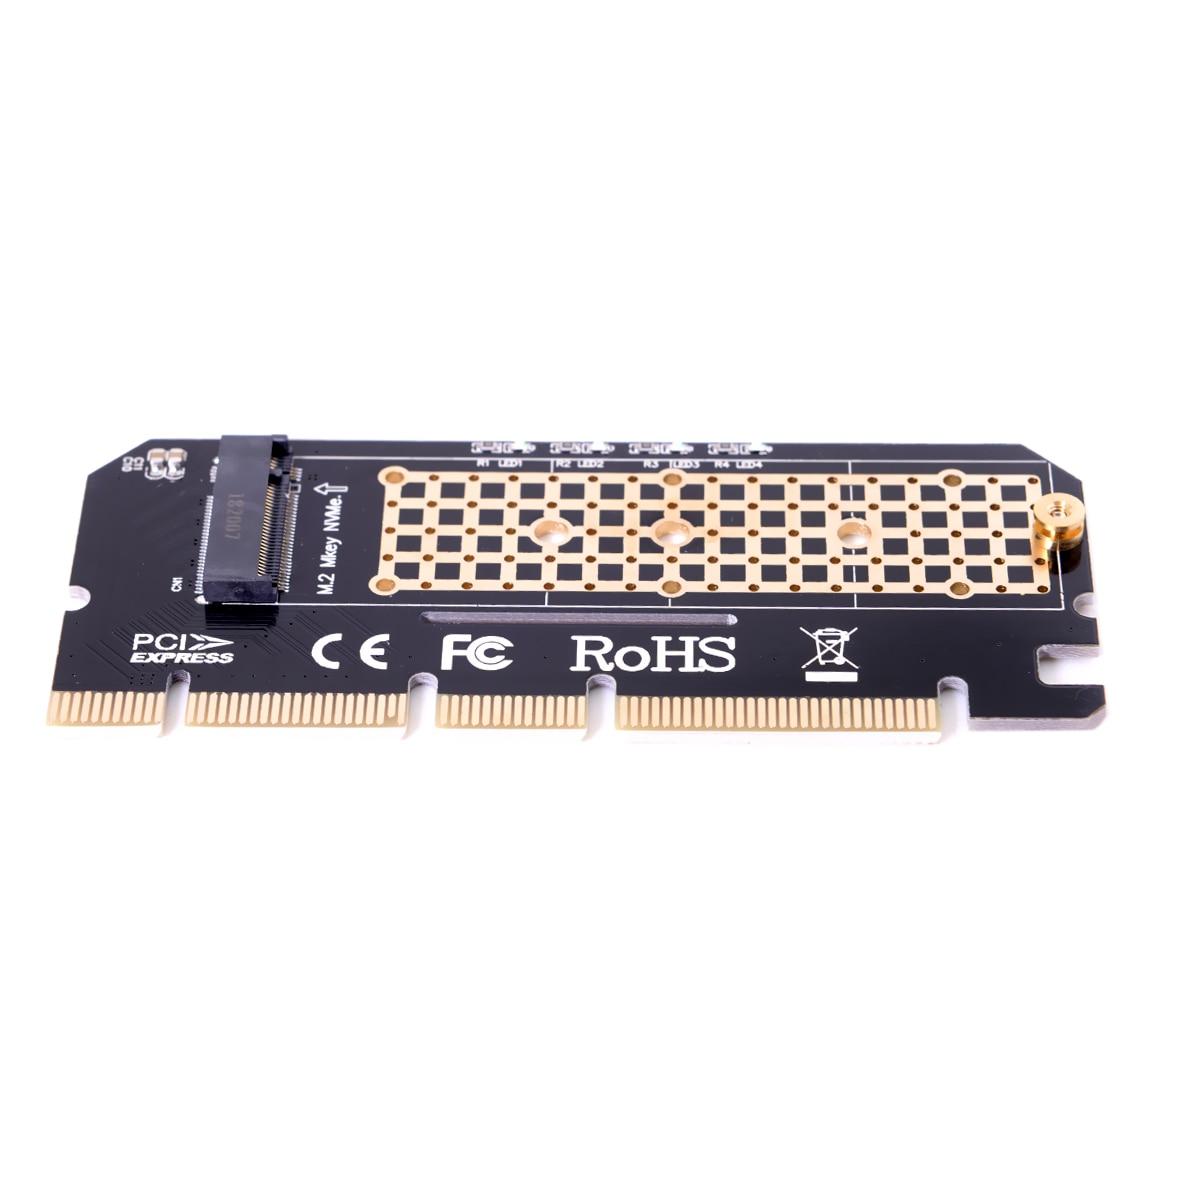 Placa base PCI-E 3,0 16x 4x adaptador a NGFF m-key NVME AHCI SSD para XP941 SM951 PM951 970 960 EVO SSD